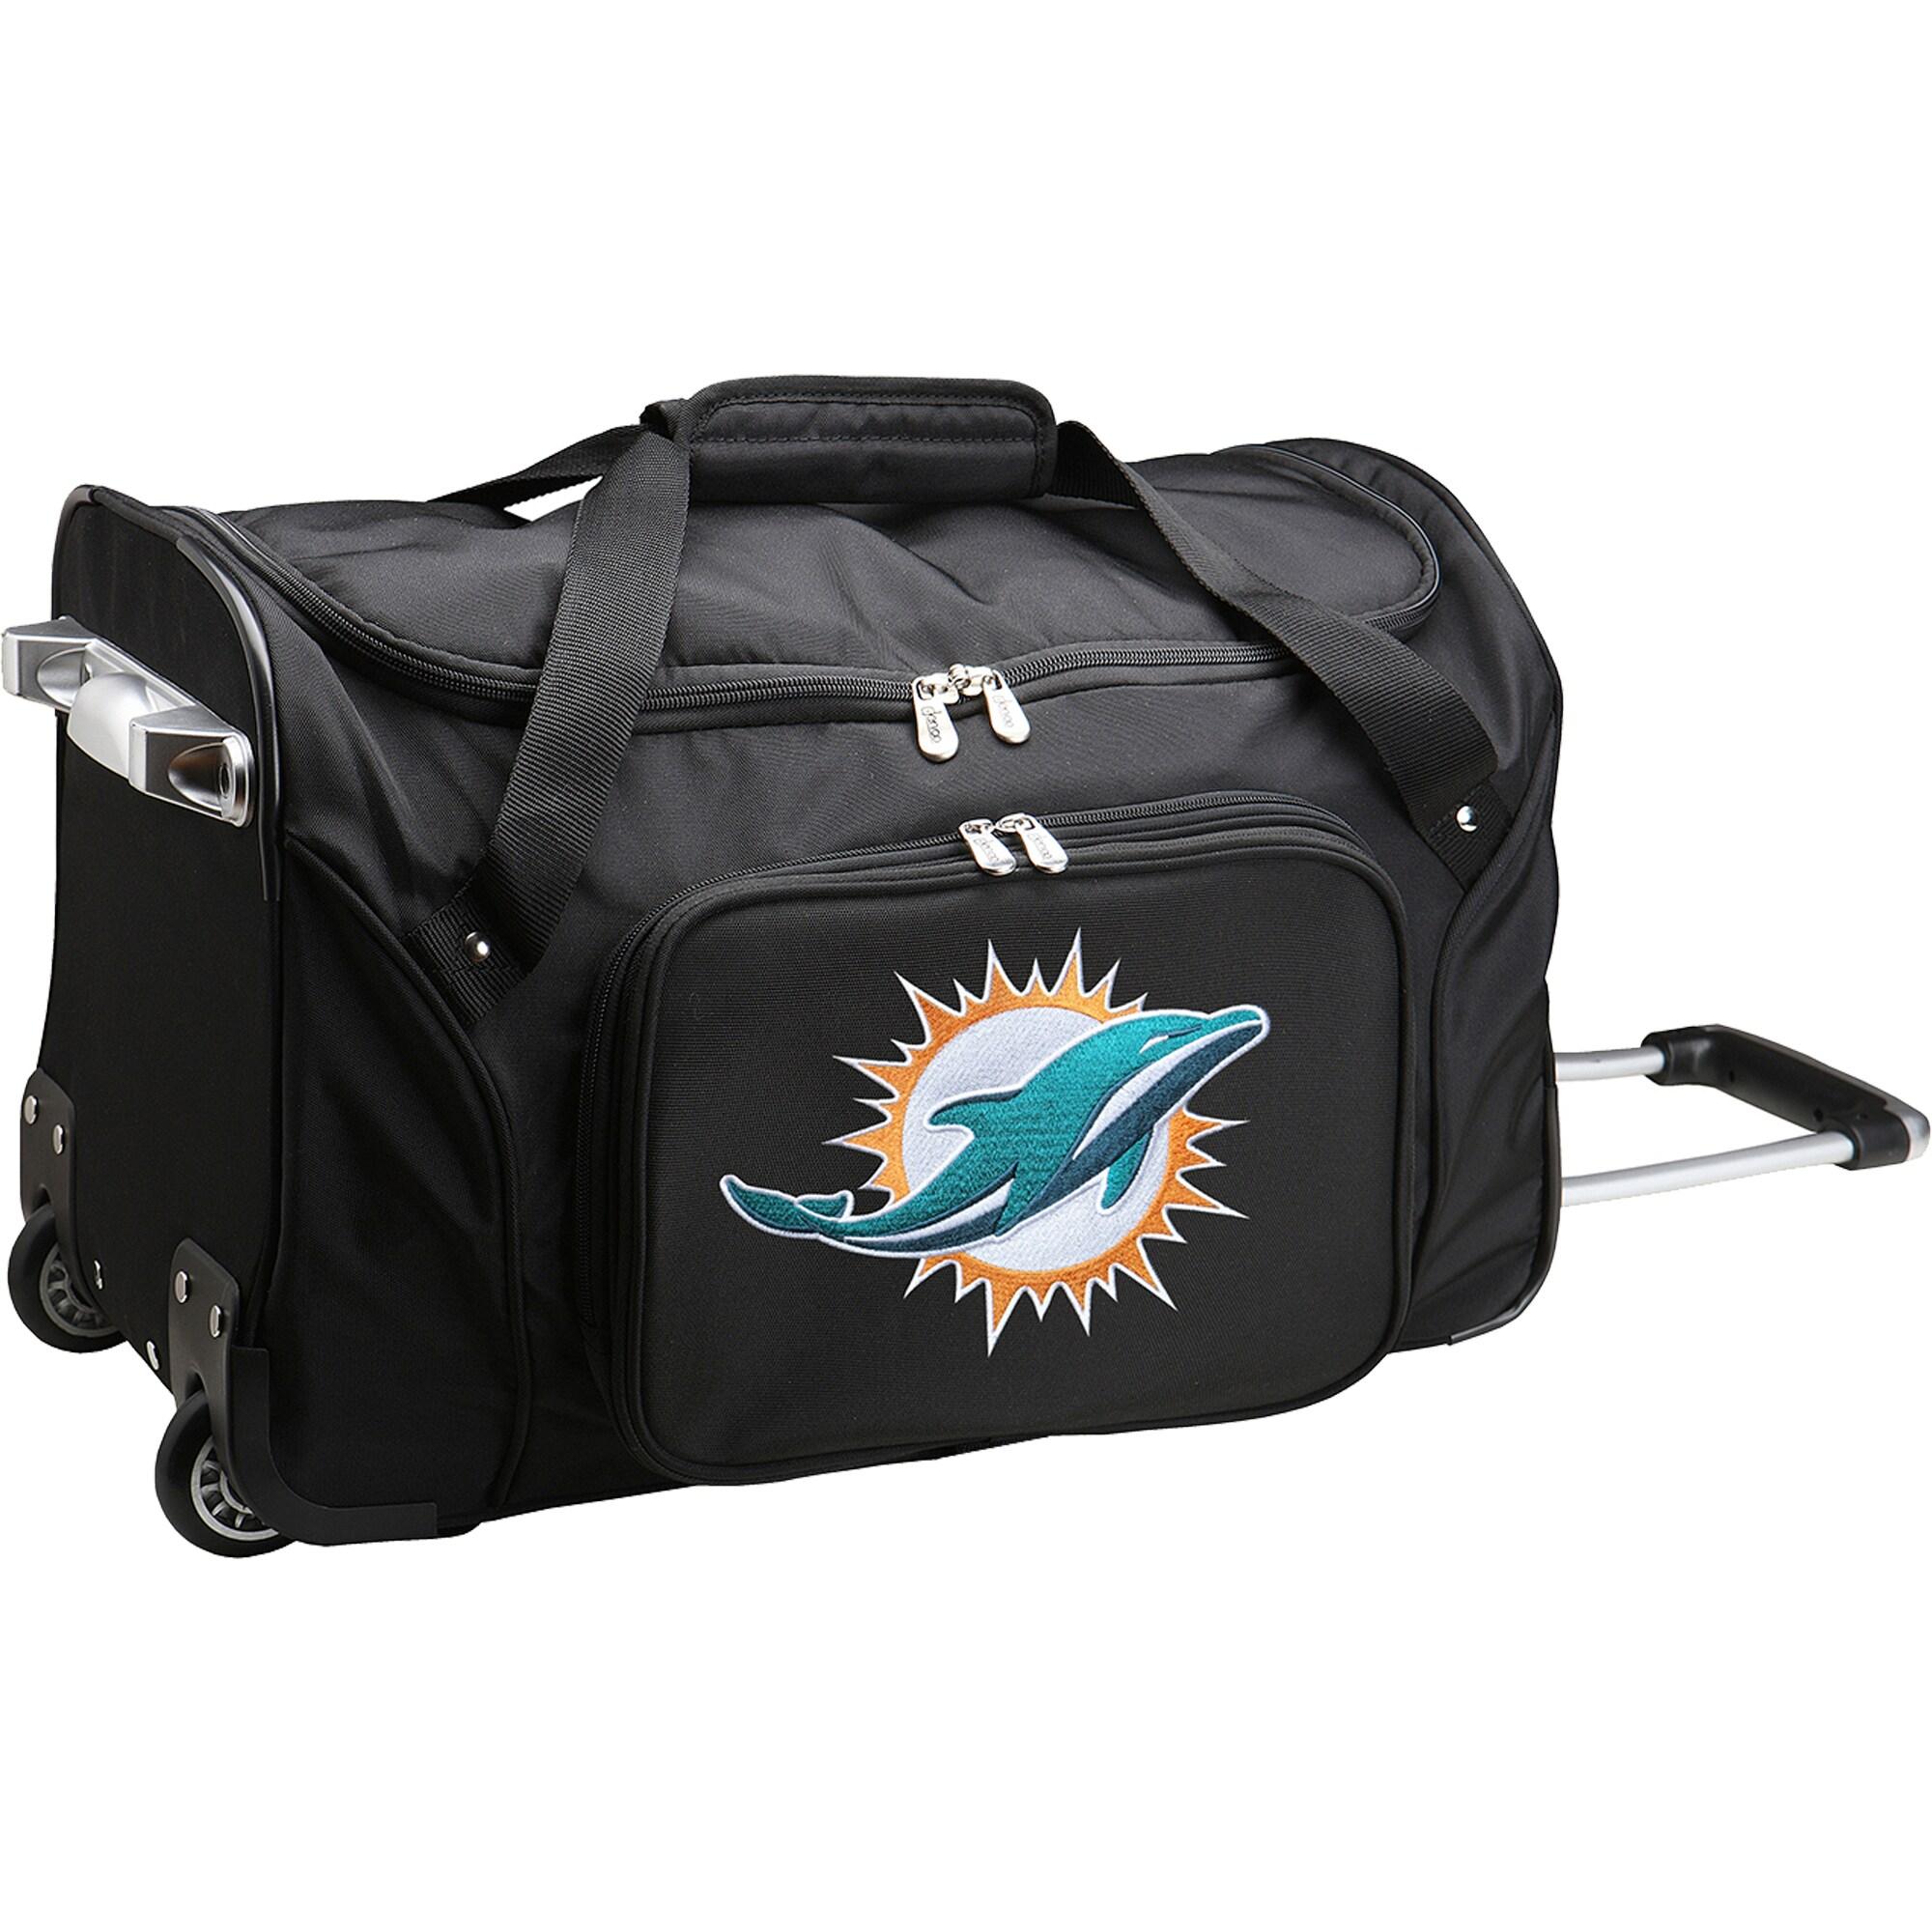 "Miami Dolphins 22"" 2-Wheeled Duffel Bag - Black"